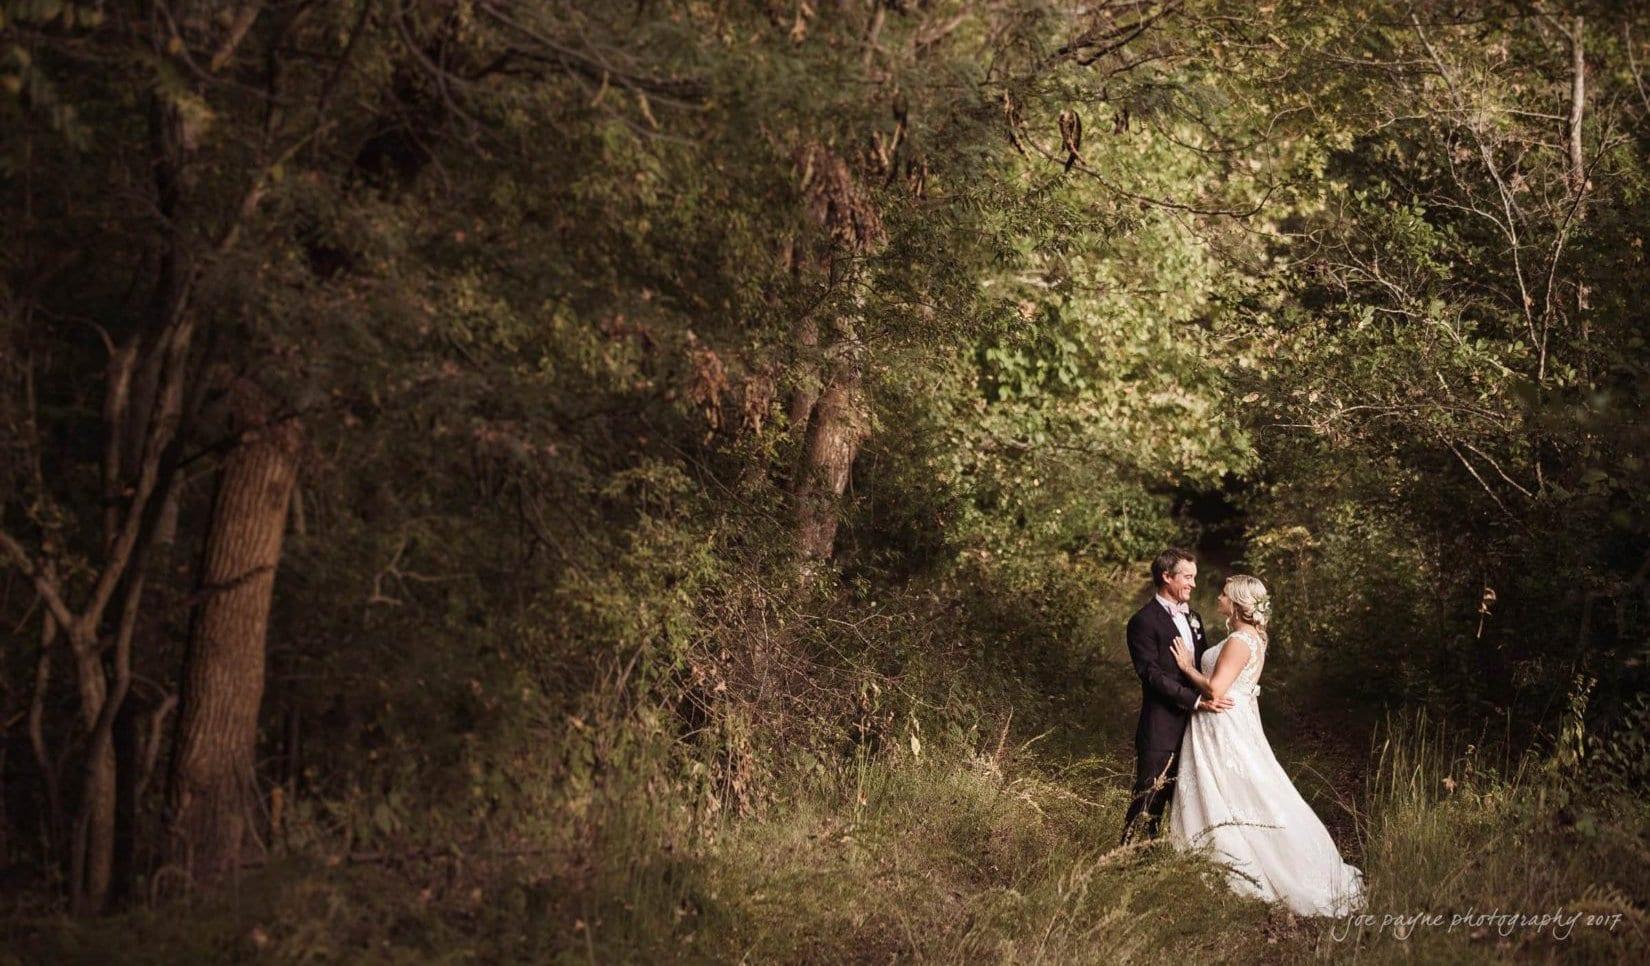 winmock wedding photographer hallie cullen 56 1650x1100 1